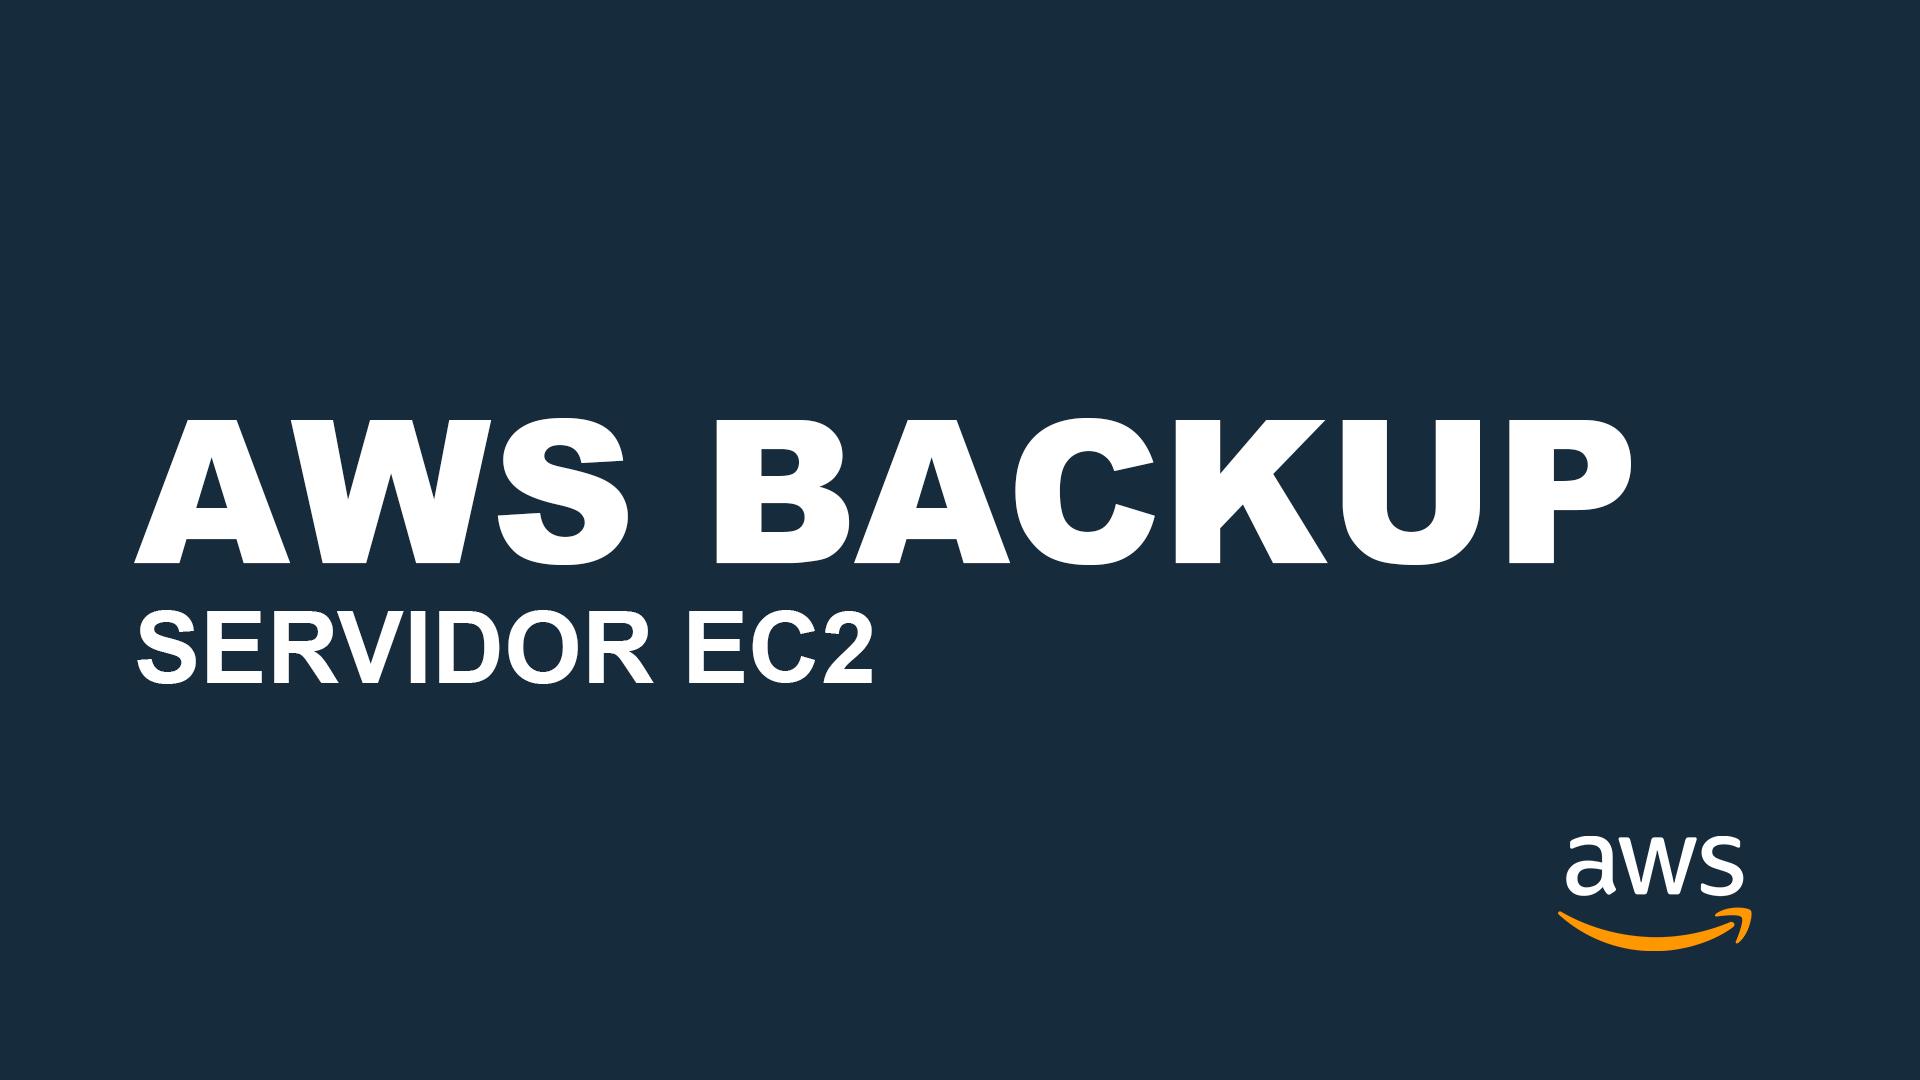 backup servidor ec2 aws backup